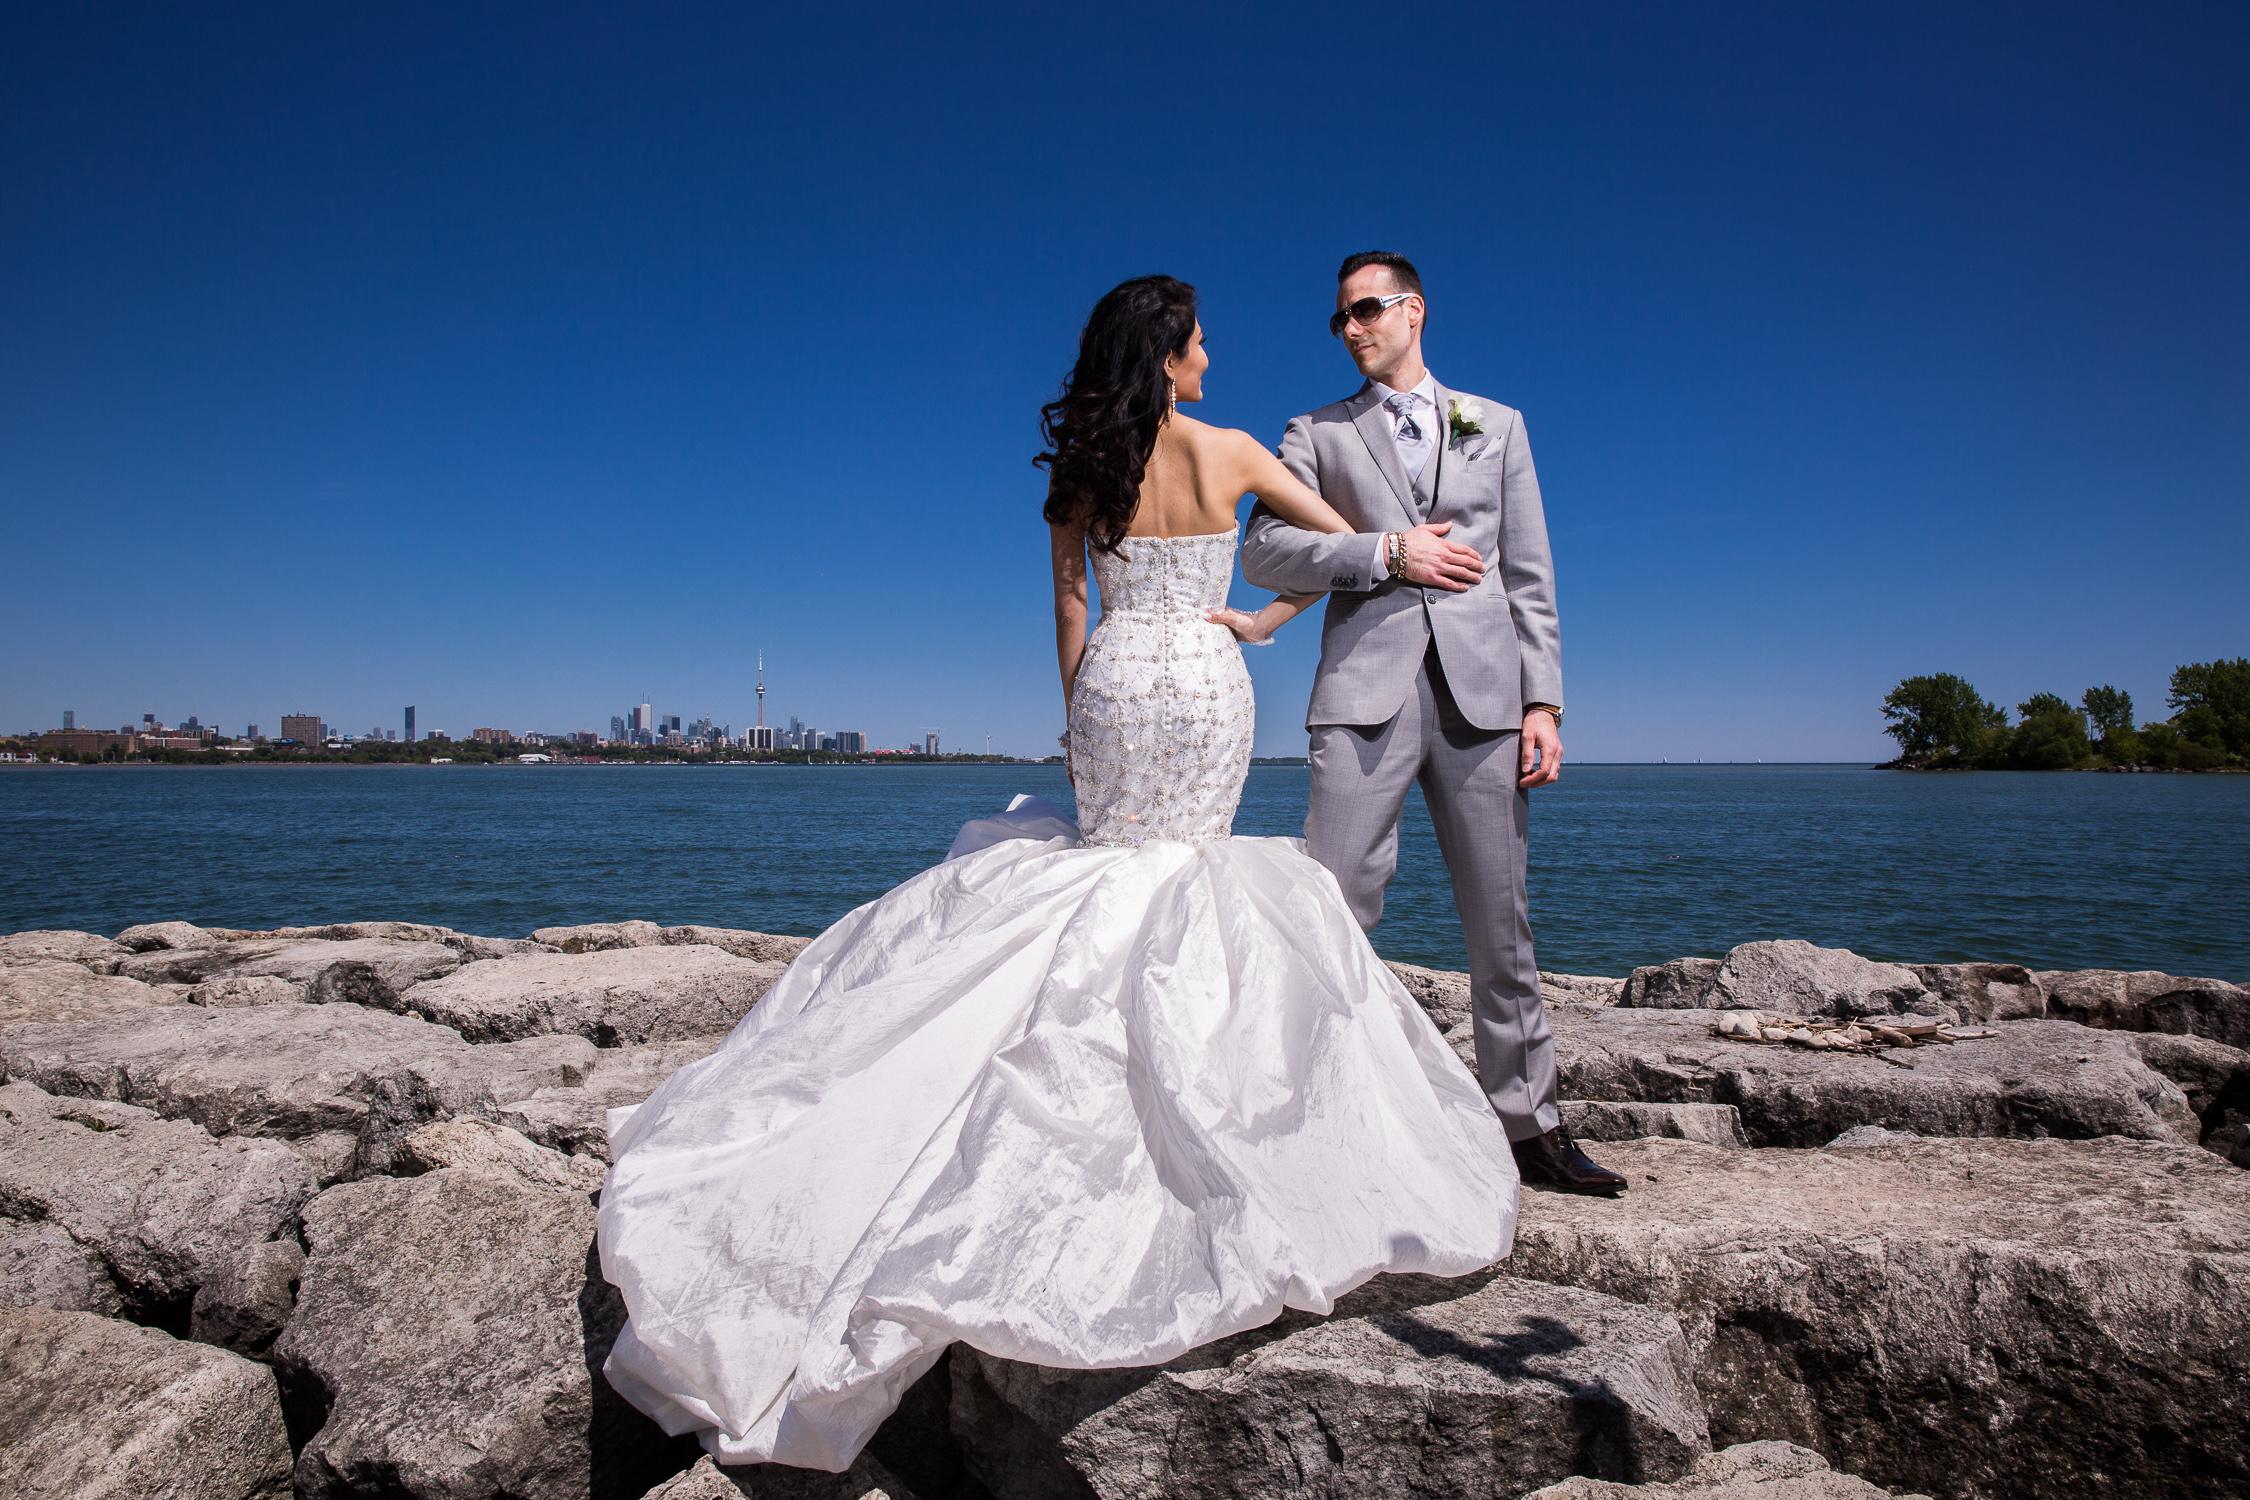 Paradise-Banquet-Hall-Wedding-Vaughan-Ontario-0054.jpg